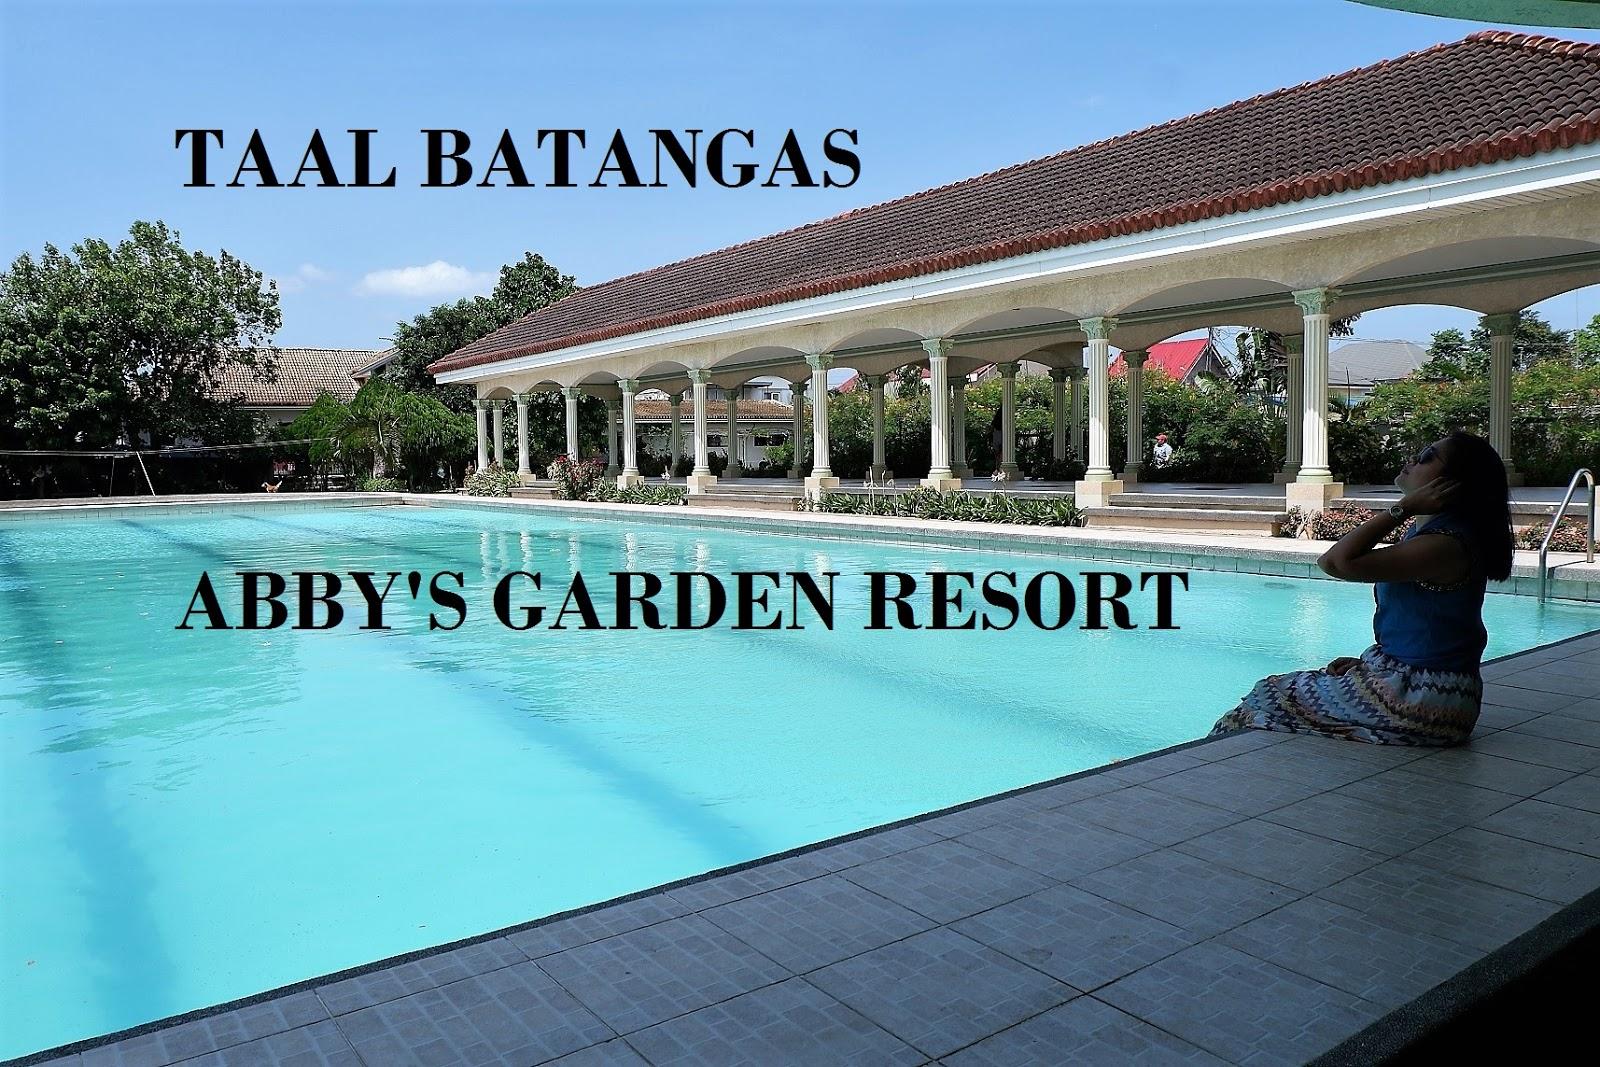 Taal Batangas Venue: Abby's Garden Resort